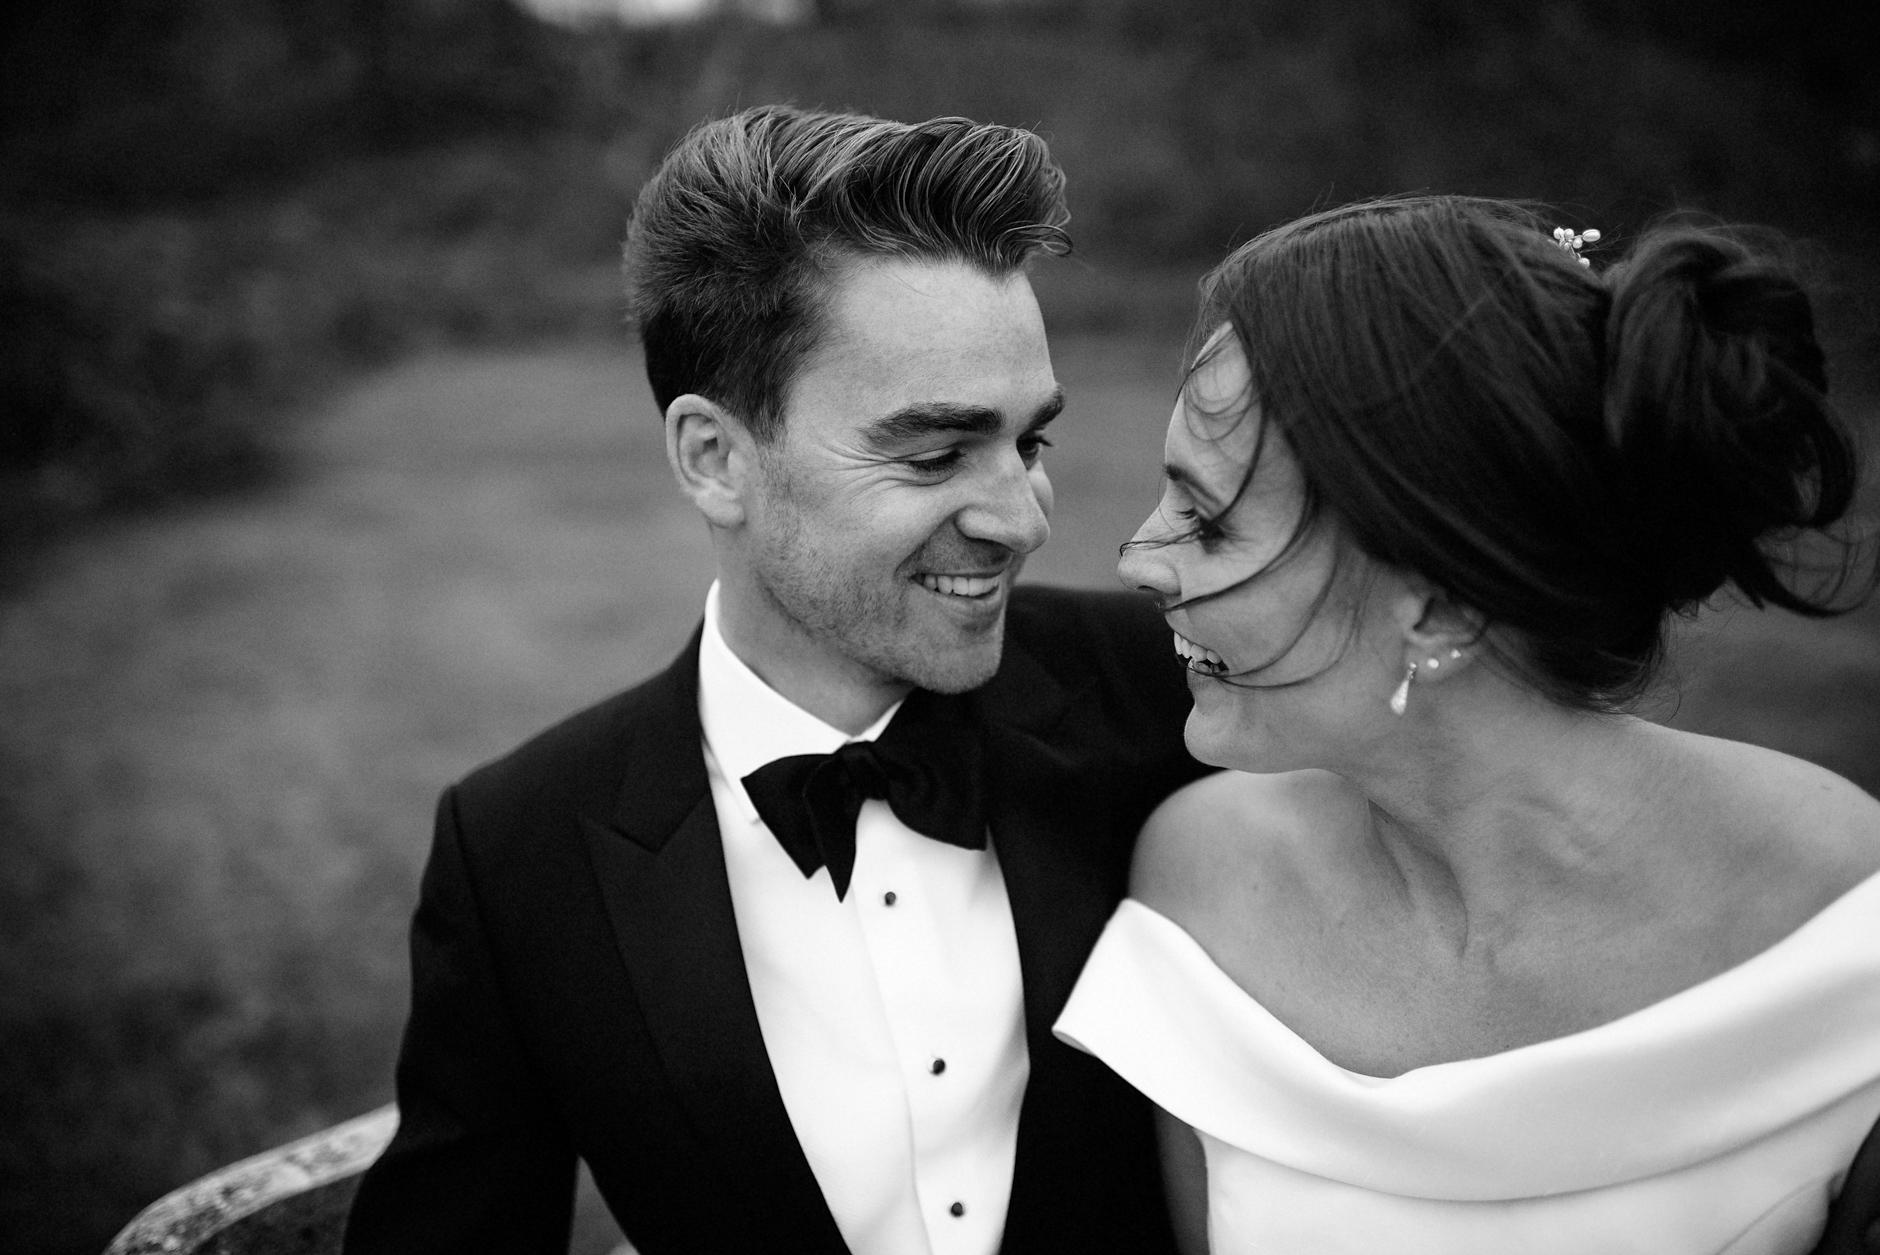 Glentruim-Wedding-Nikki-Leadbetter-Photography-190.jpg